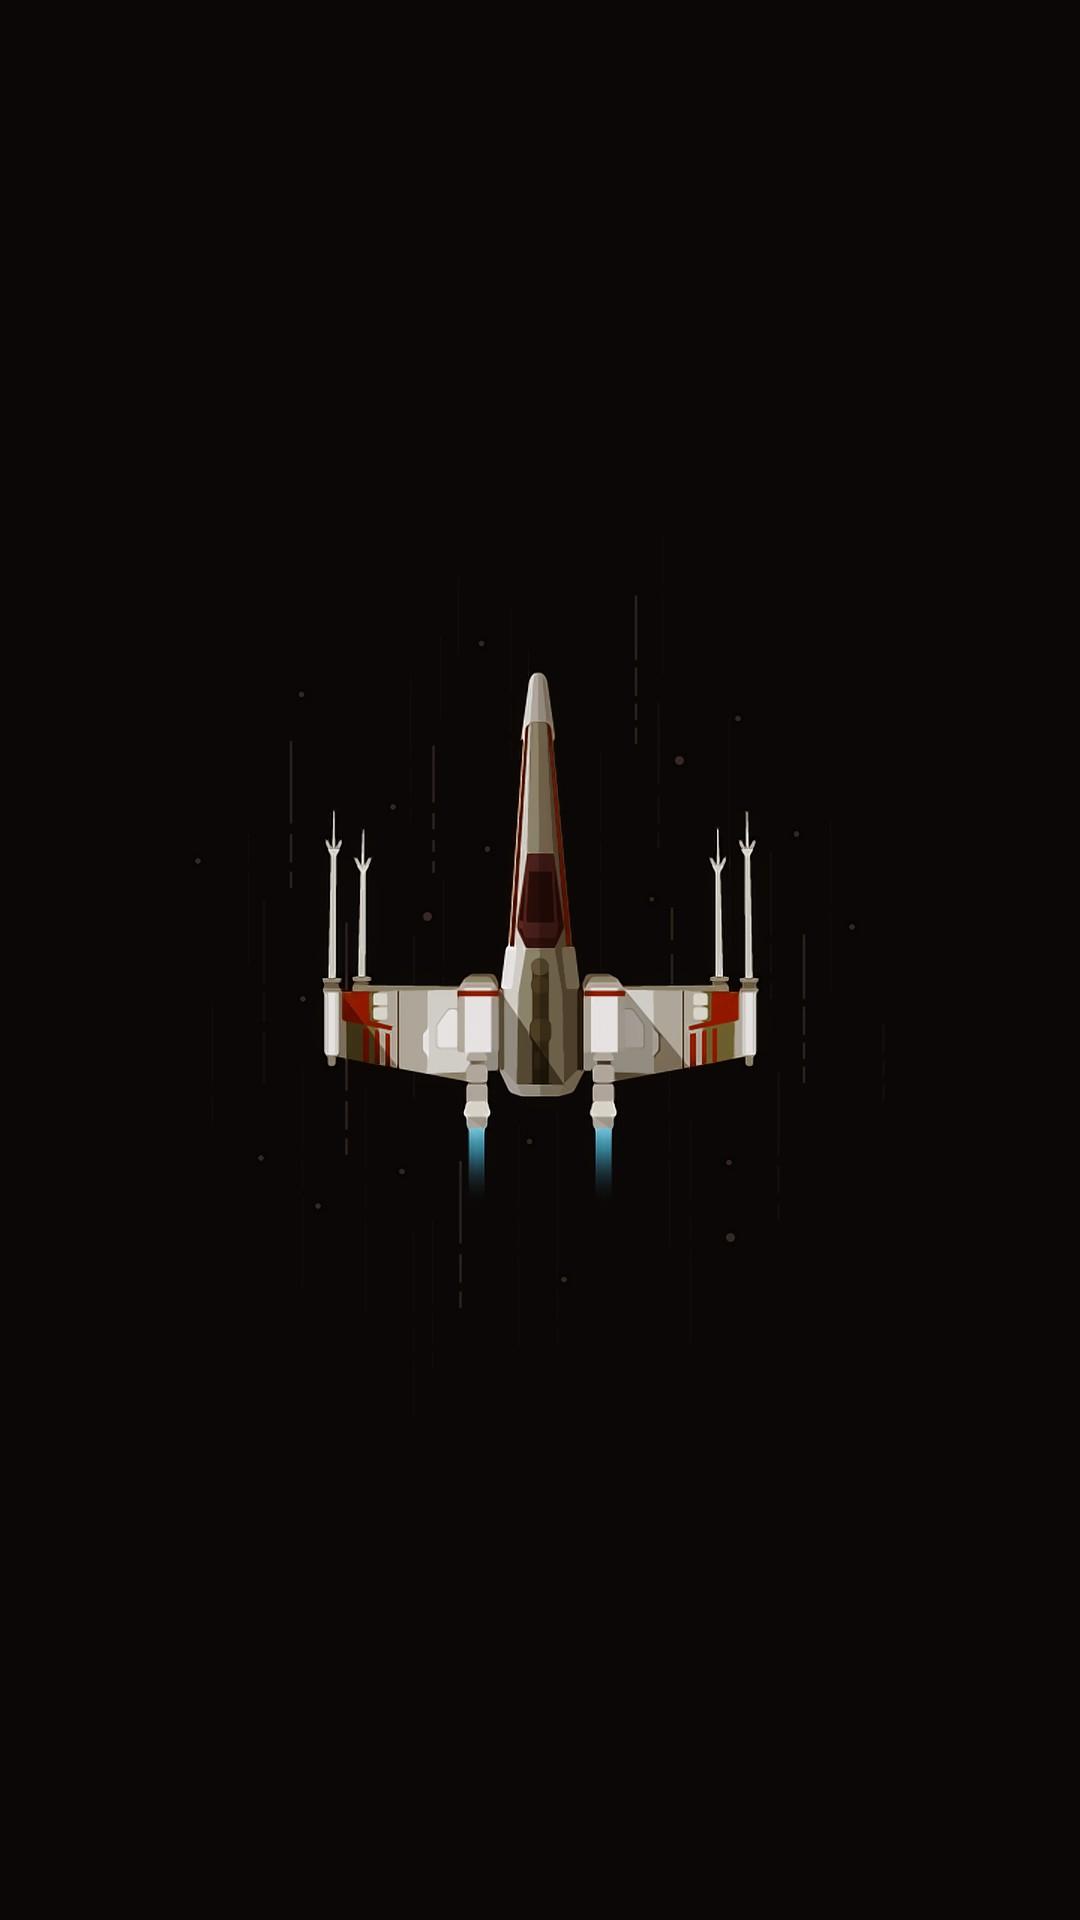 Star Ship iPhone Wallpaper